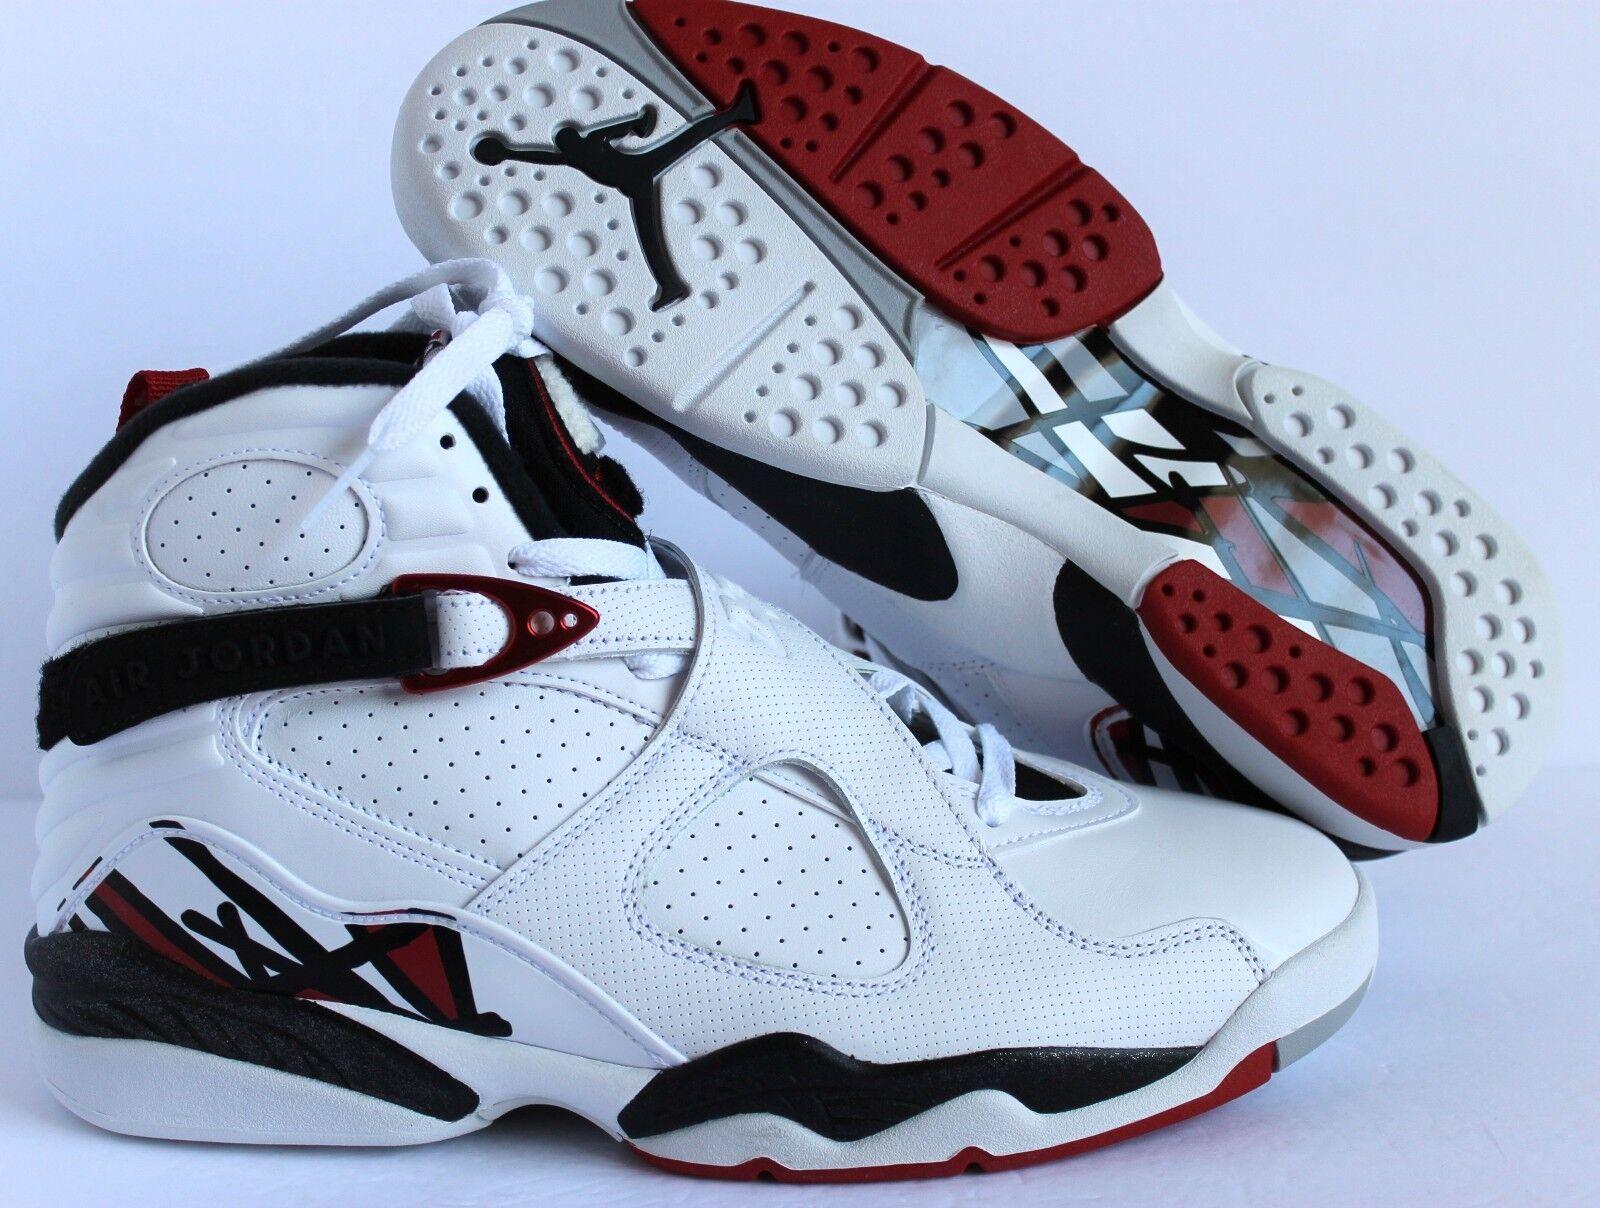 Nike air jordan 8 retrò white-red-wolf grey hare sz 11 alternativo.